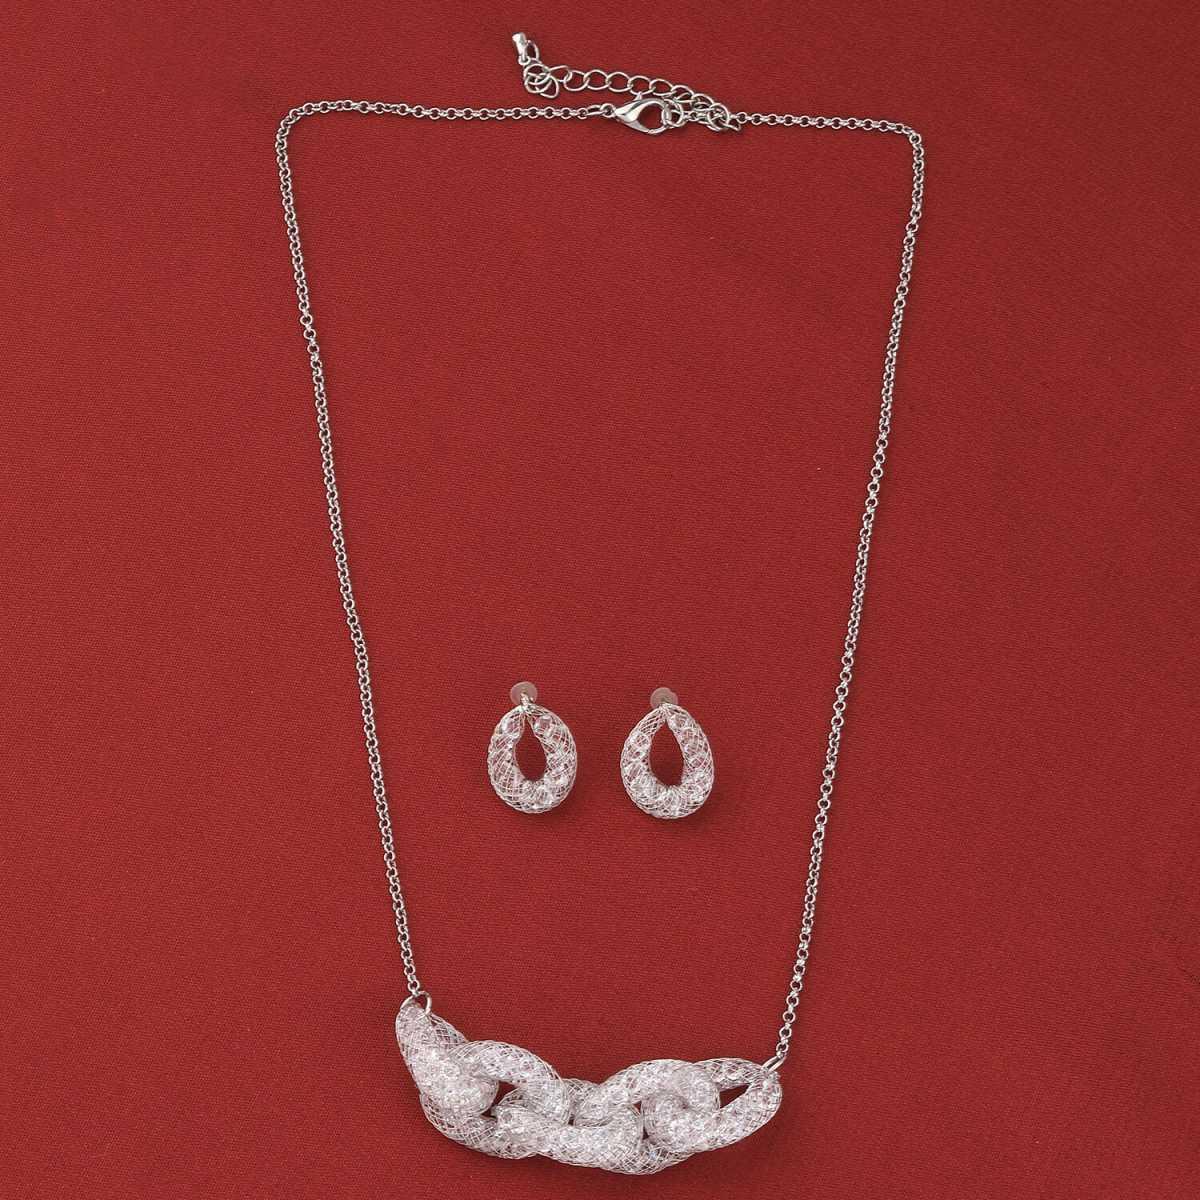 SILVER SHINE Elegant Party Wear Different Designe Pendant Set For Women Girl